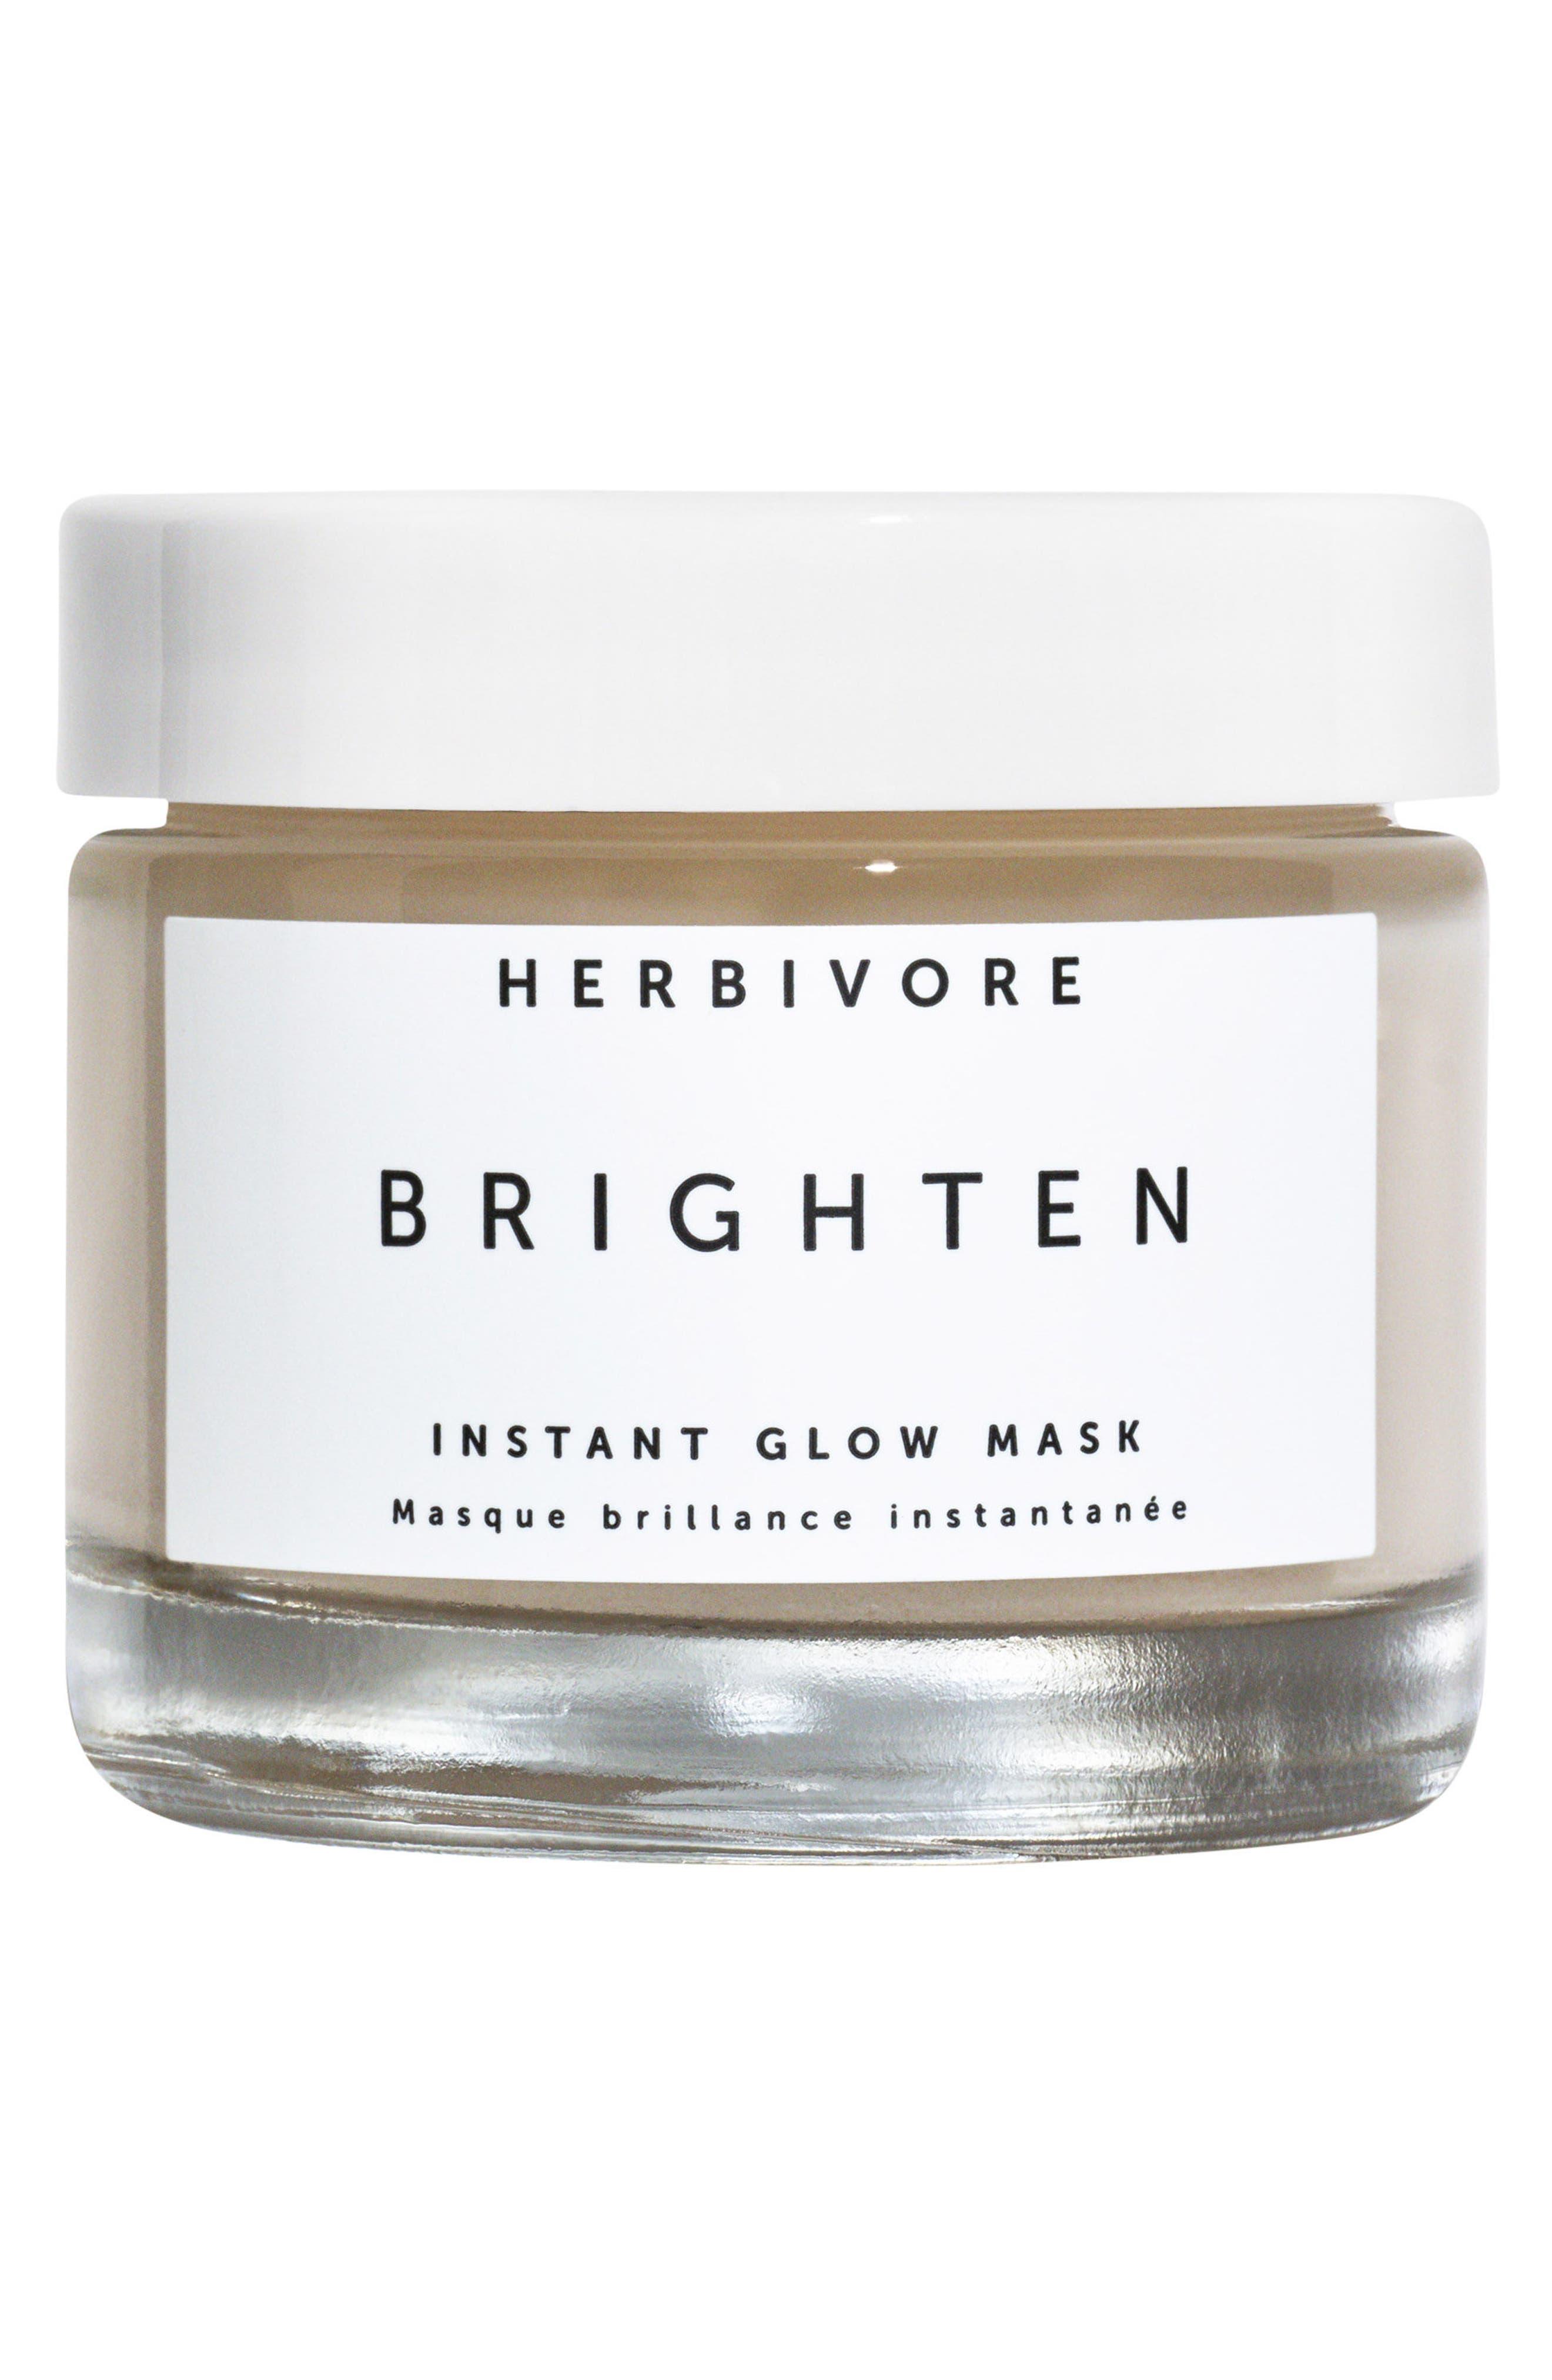 HERBIVORE BOTANICALS, Brighten Pineapple Enzyme + Gemstone Instant Glow Mask, Main thumbnail 1, color, NO COLOR